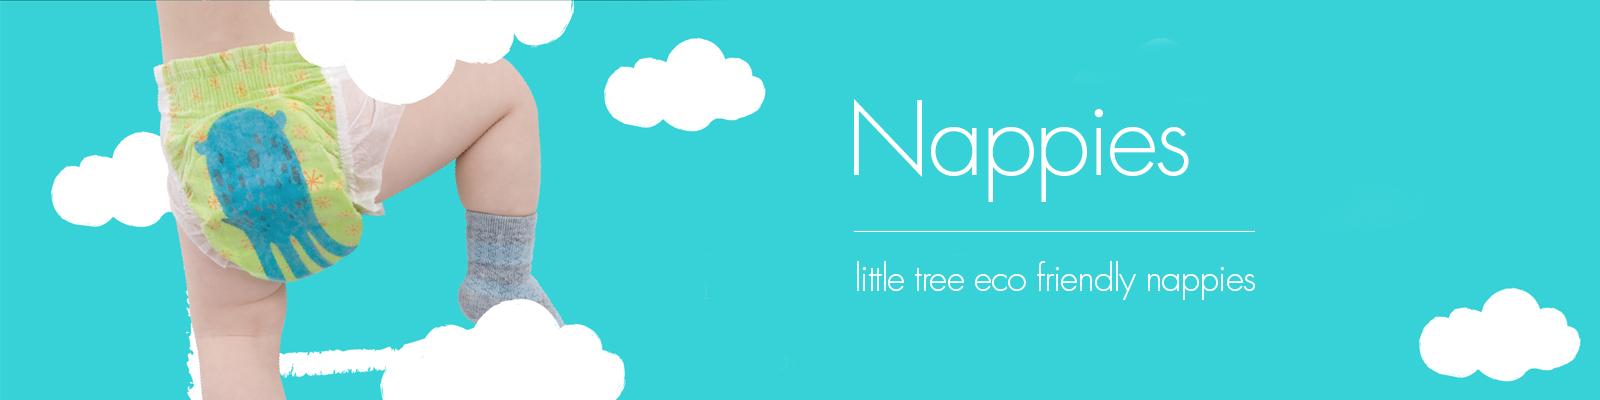 Desktop Banner for Jual Popok Bayi Little Tree Harga Murah